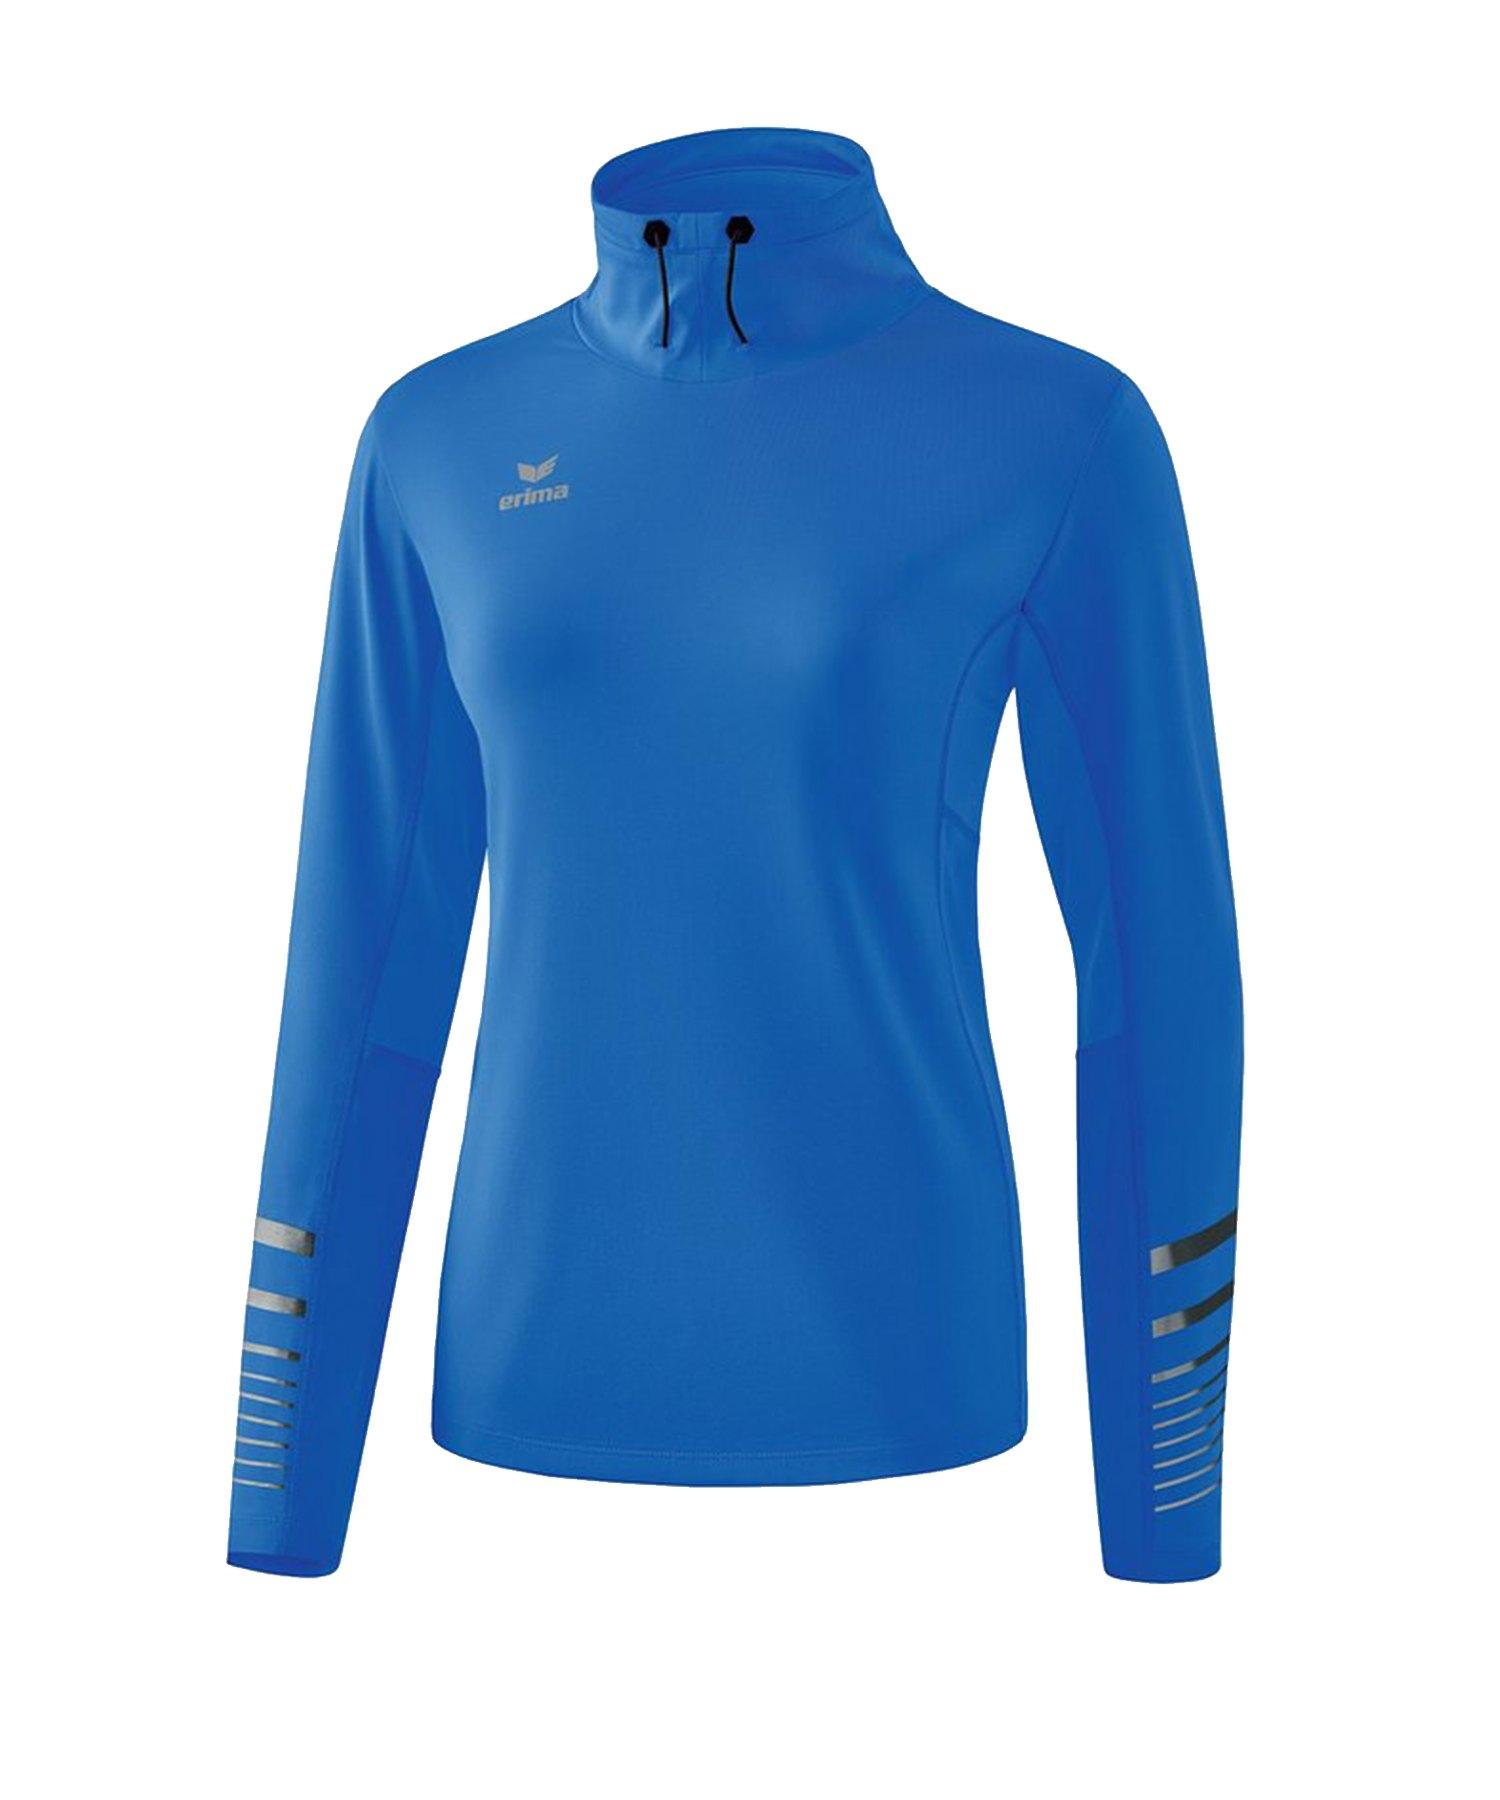 Erima Race Line 2.0 Running Longsleeve Damen Blau - Blau